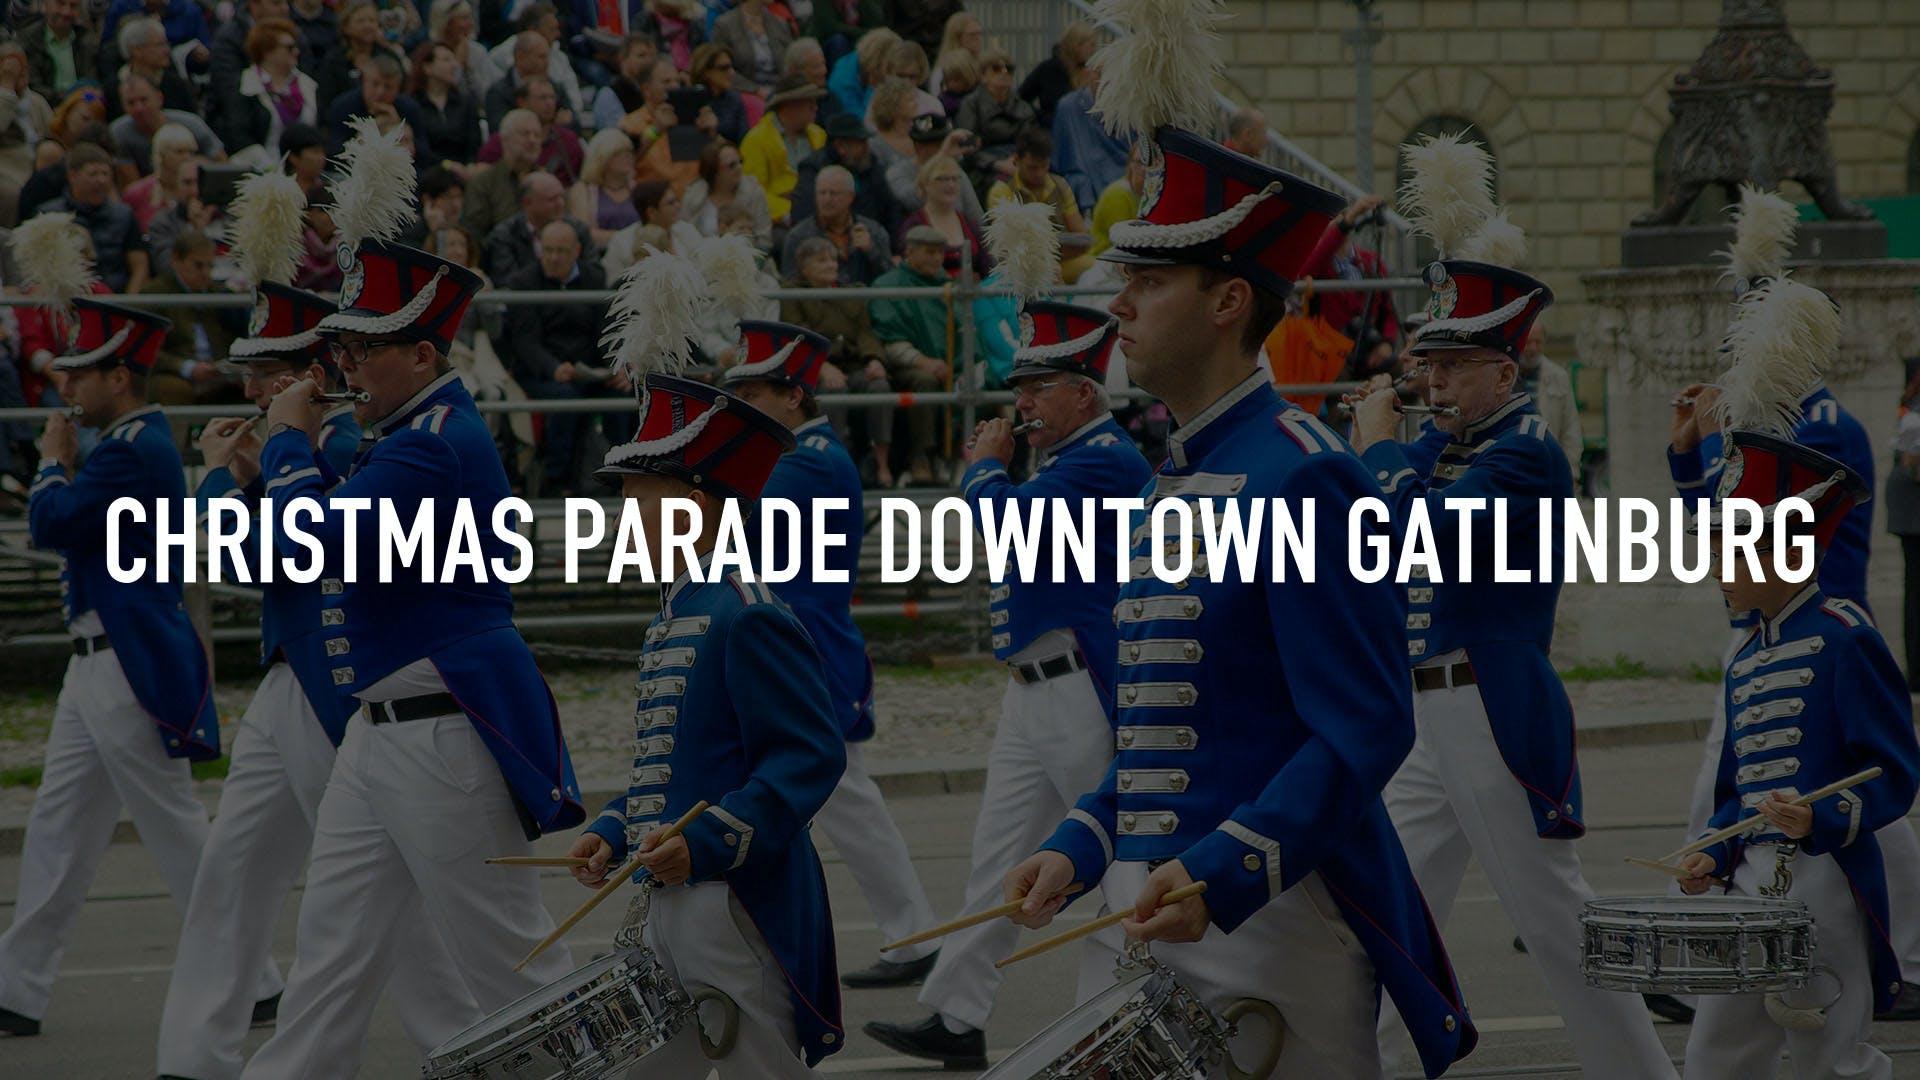 Christmas Parade Downtown Gatlinburg